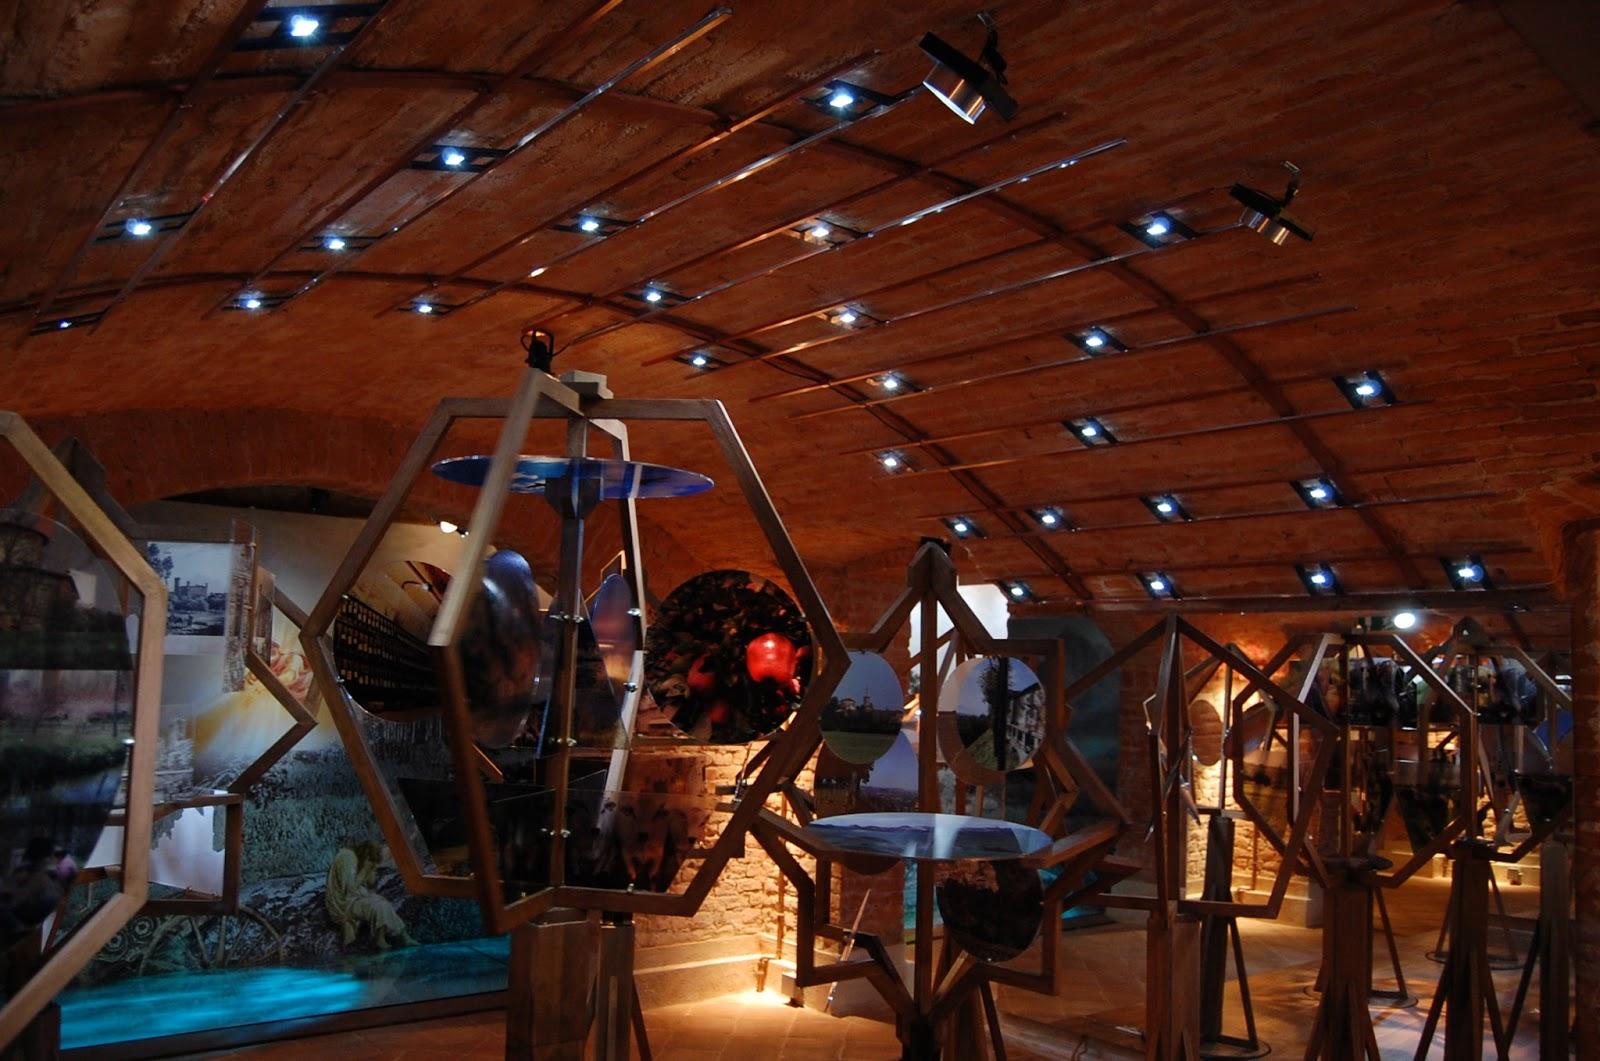 Illuminazione led casa: illuminazione a led per larte lelide per i